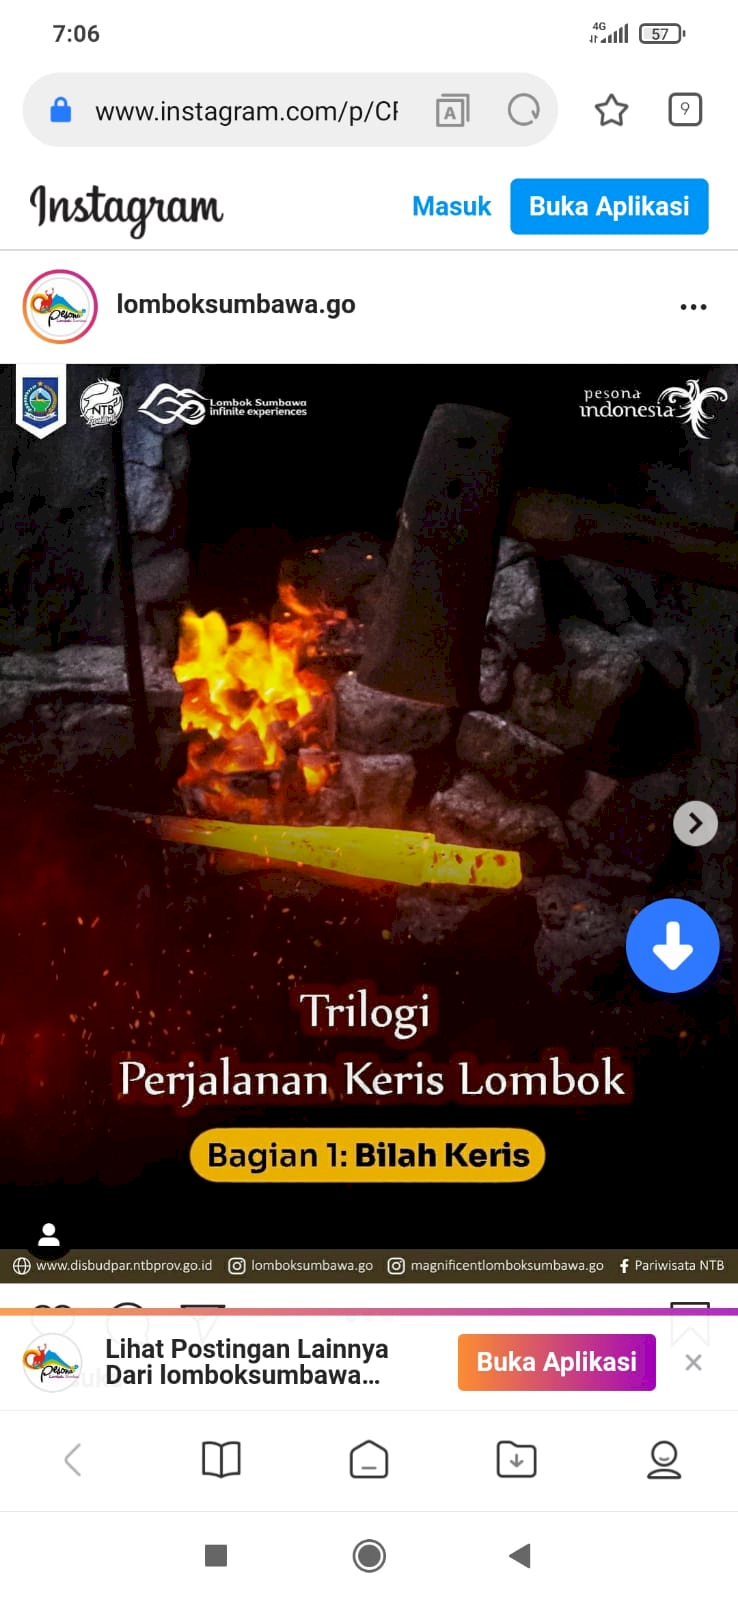 Pertahankan Warisan Budaya, Pemprov NTB Gagas Trilogi Perjalanan Keris Lombok - Foto 1